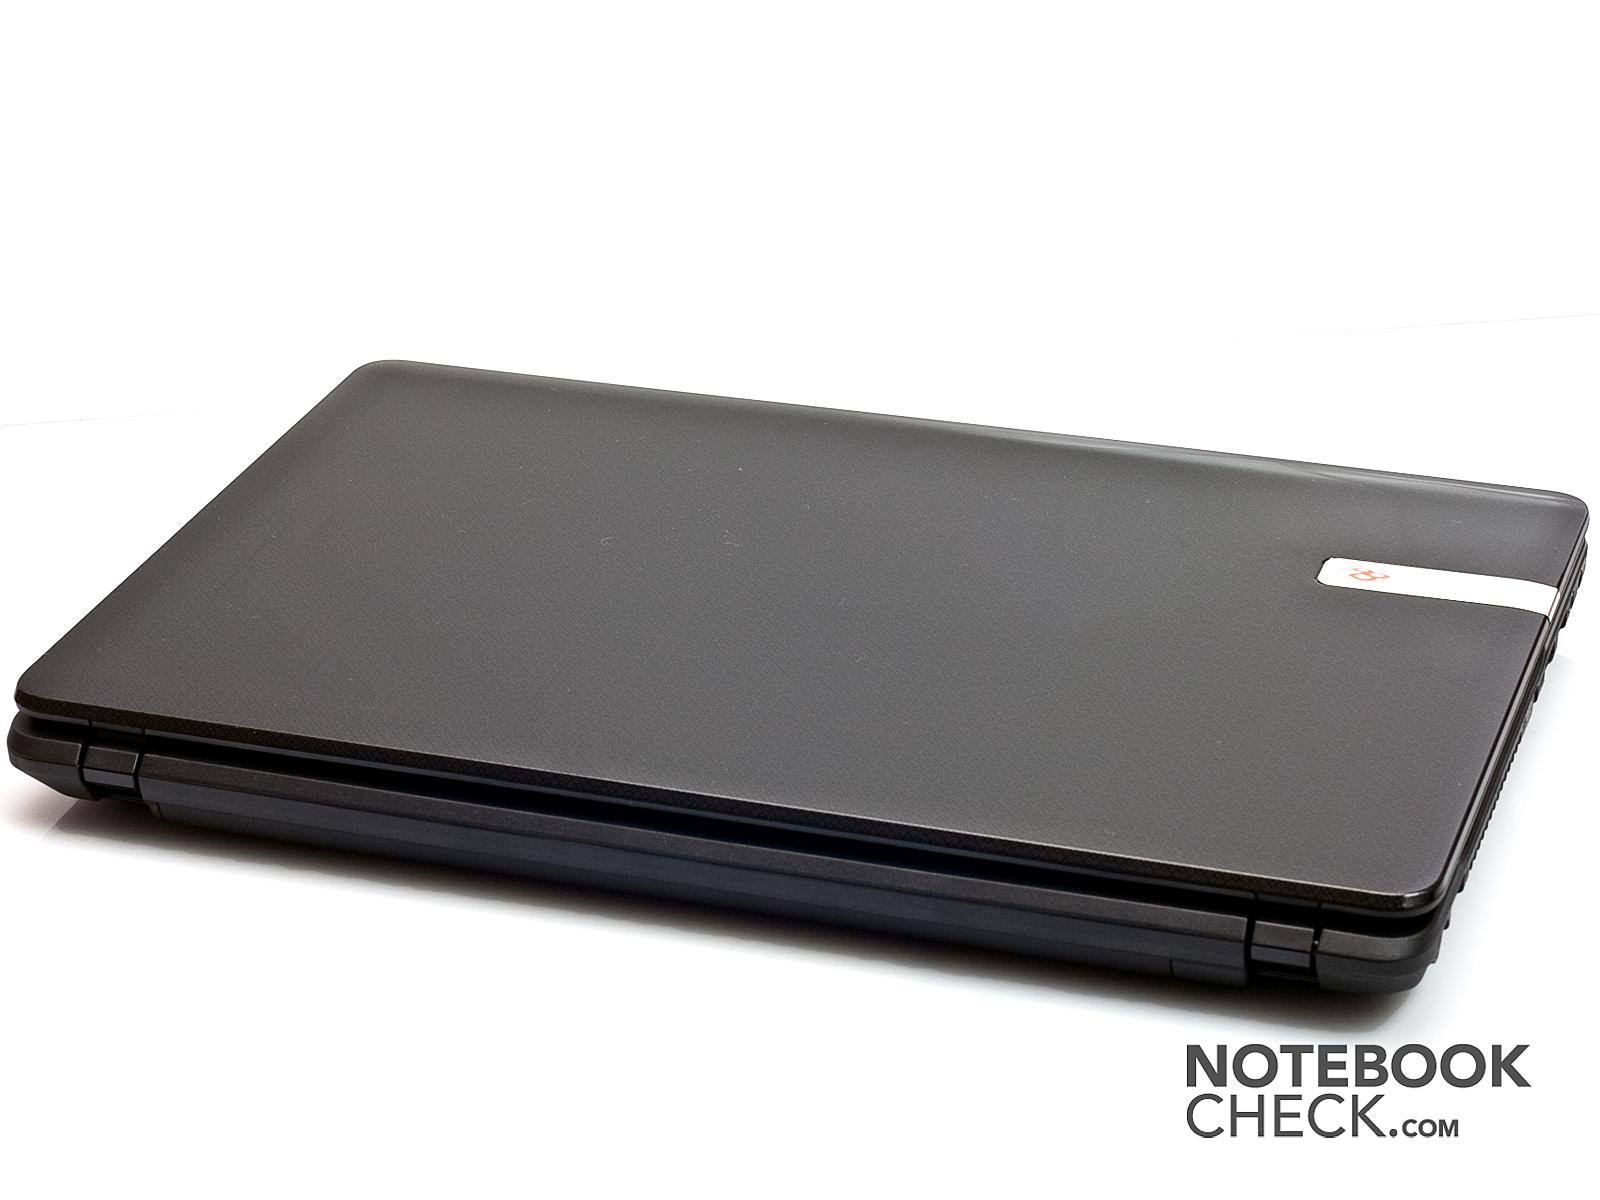 Драйвера для Packard Bell Easynote Ts